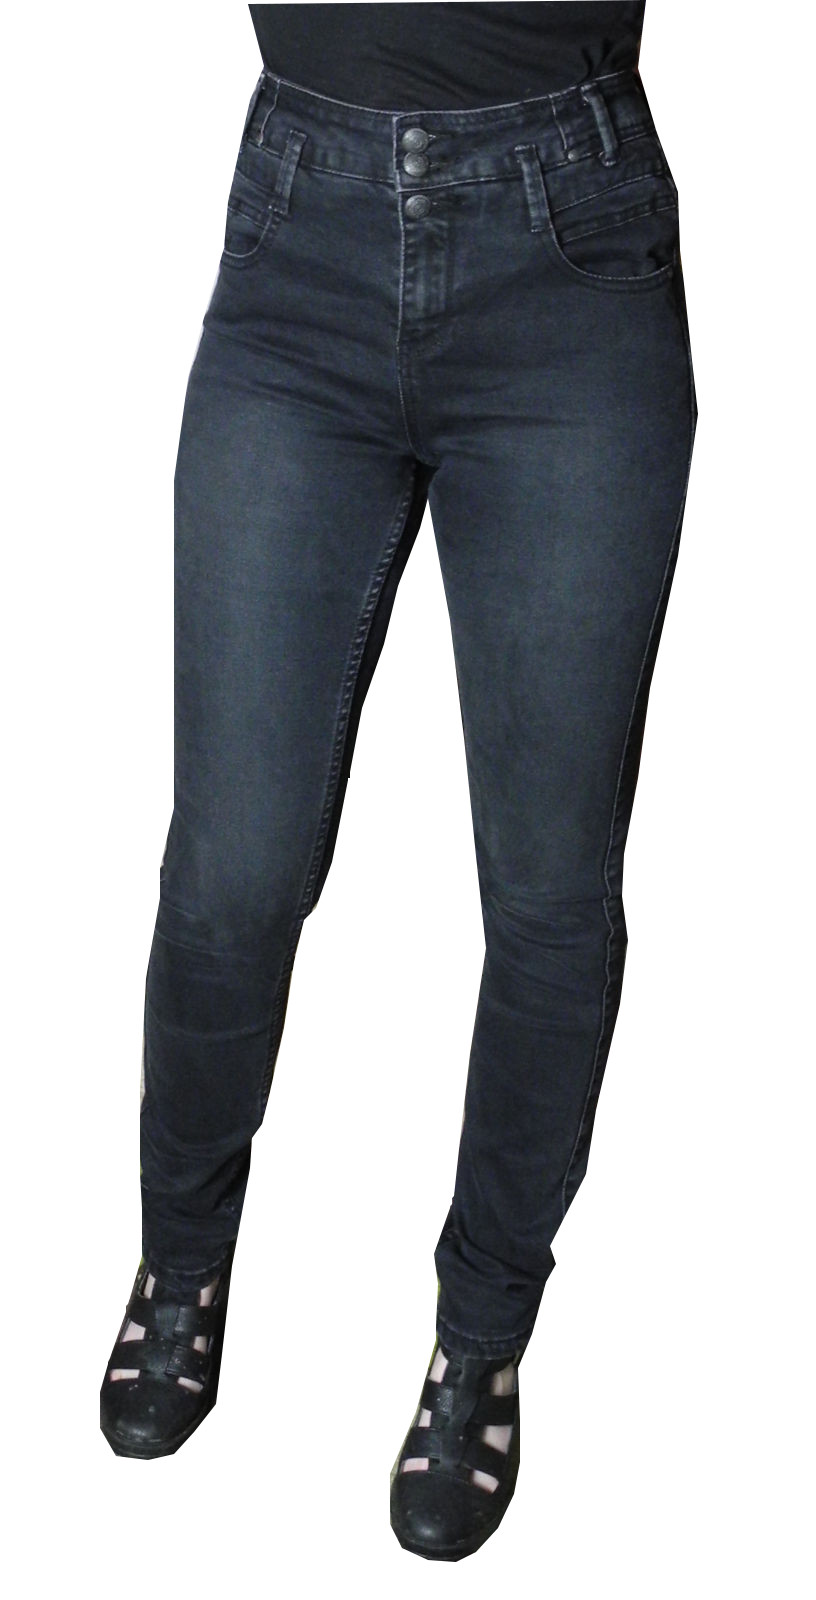 womens ladies ex new look high waist waisted jeans black blue size 8 10 12 14 16 ebay. Black Bedroom Furniture Sets. Home Design Ideas